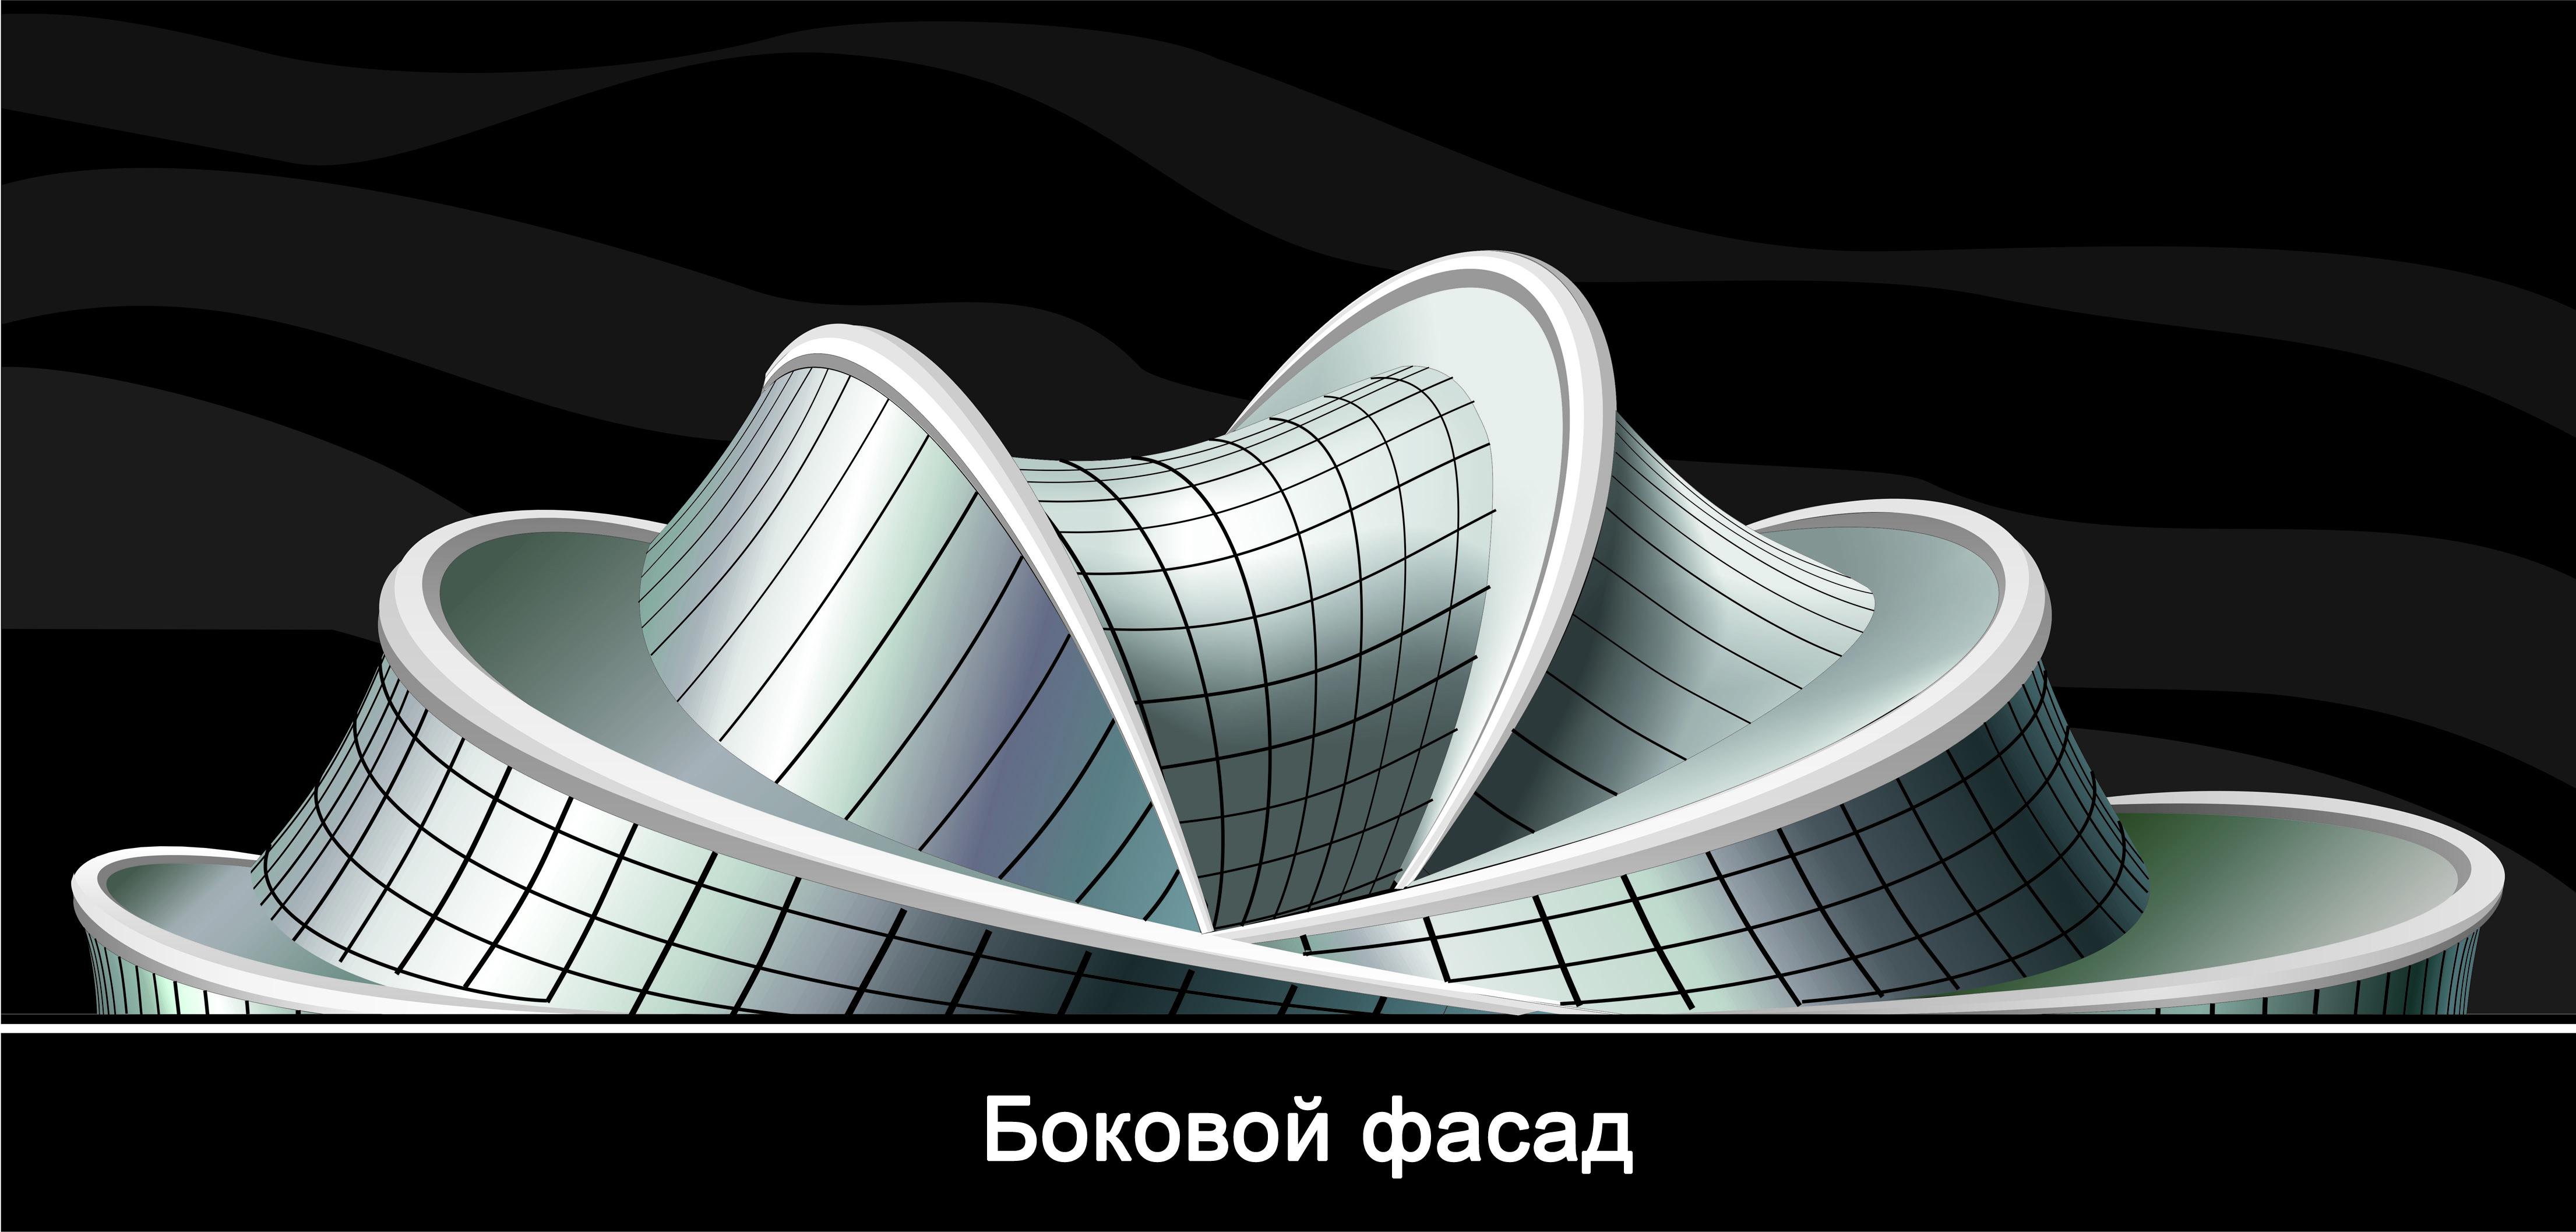 Разработка архитектурной концепции театра оперы и балета фото f_35352f67d41513ab.jpg